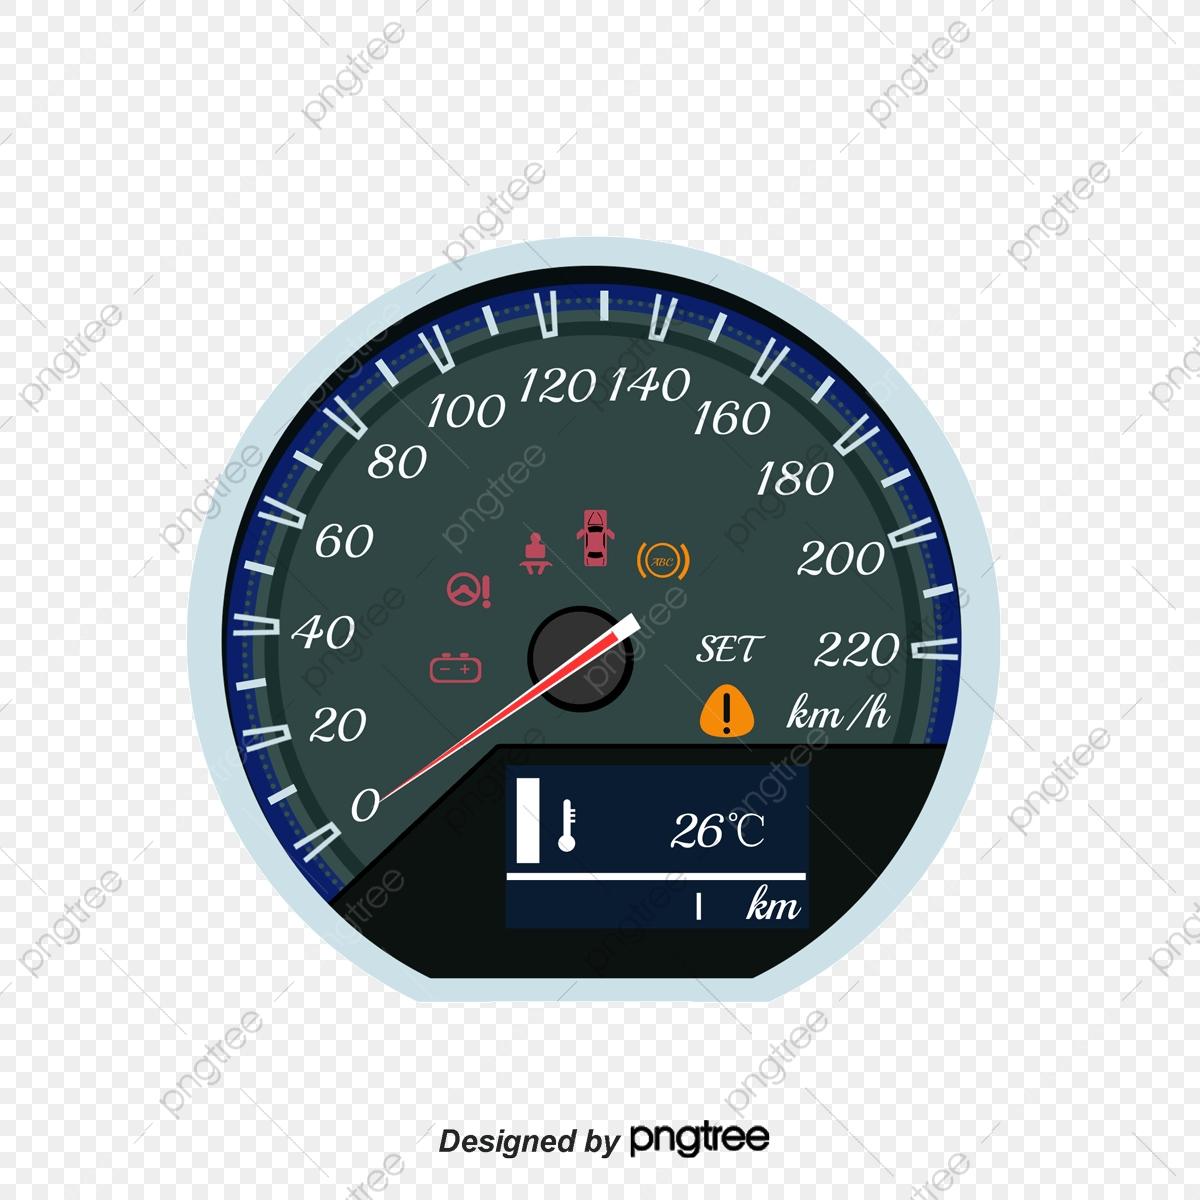 Car Dashboard Diagram Vector Car Standard Dashboard Car Vector Vector Diagram Meter Png